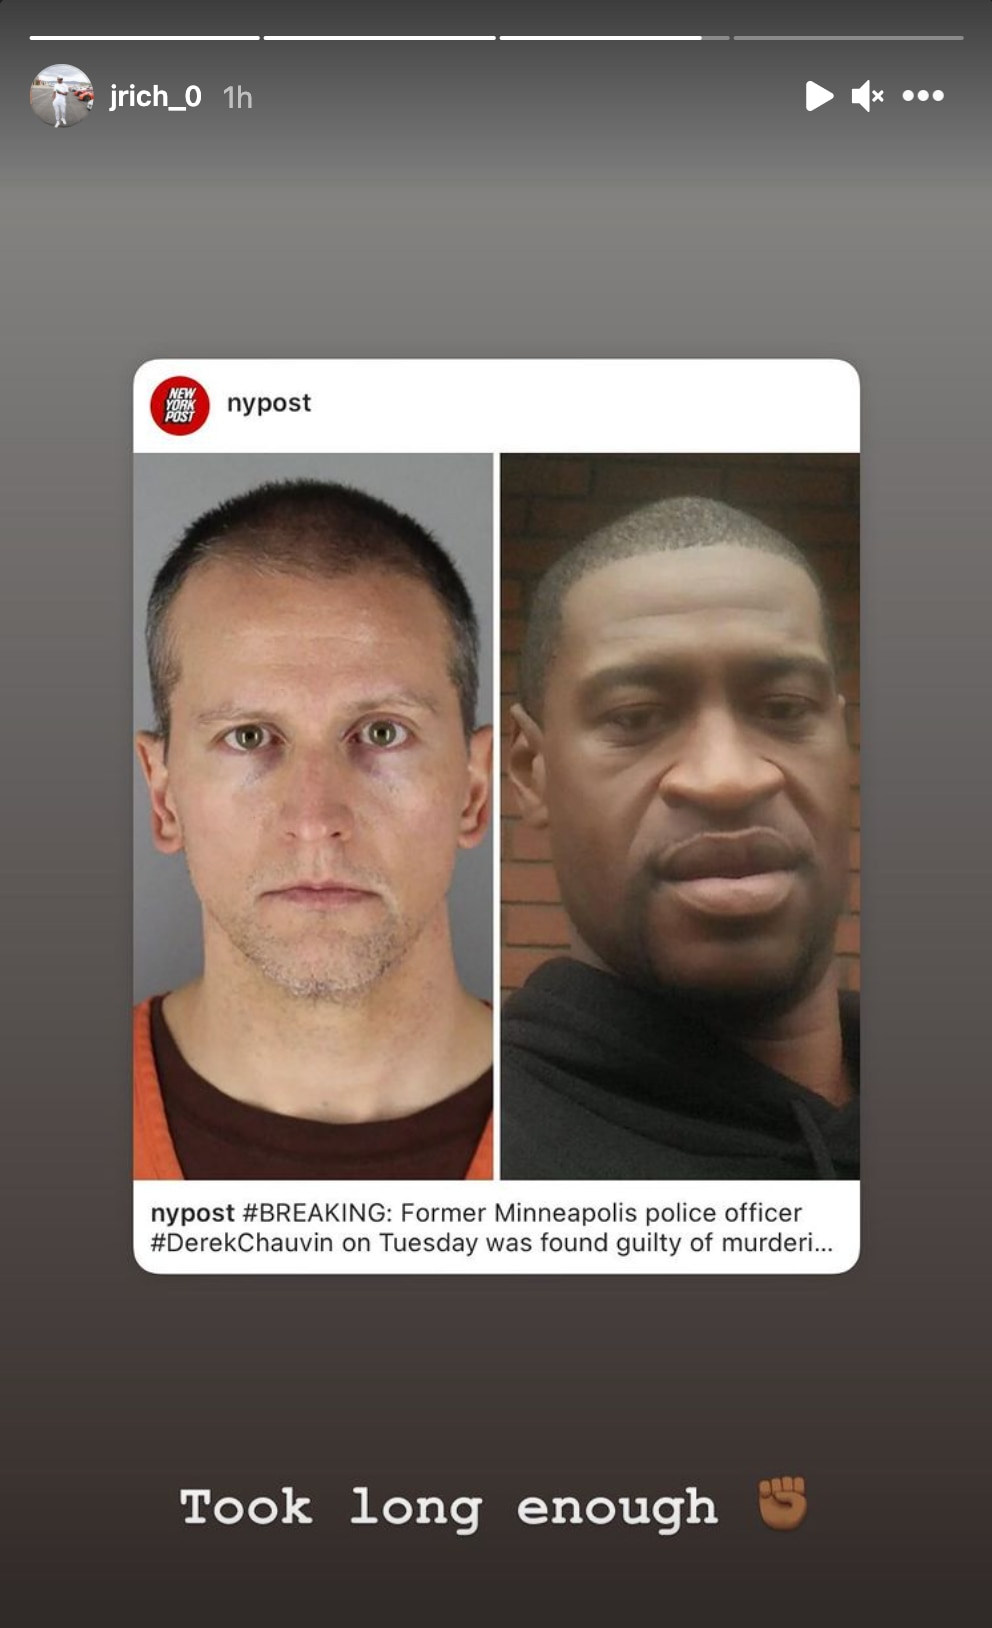 A screenshot from Dallas Mavericks guard Josh Richardson's Instagram story.